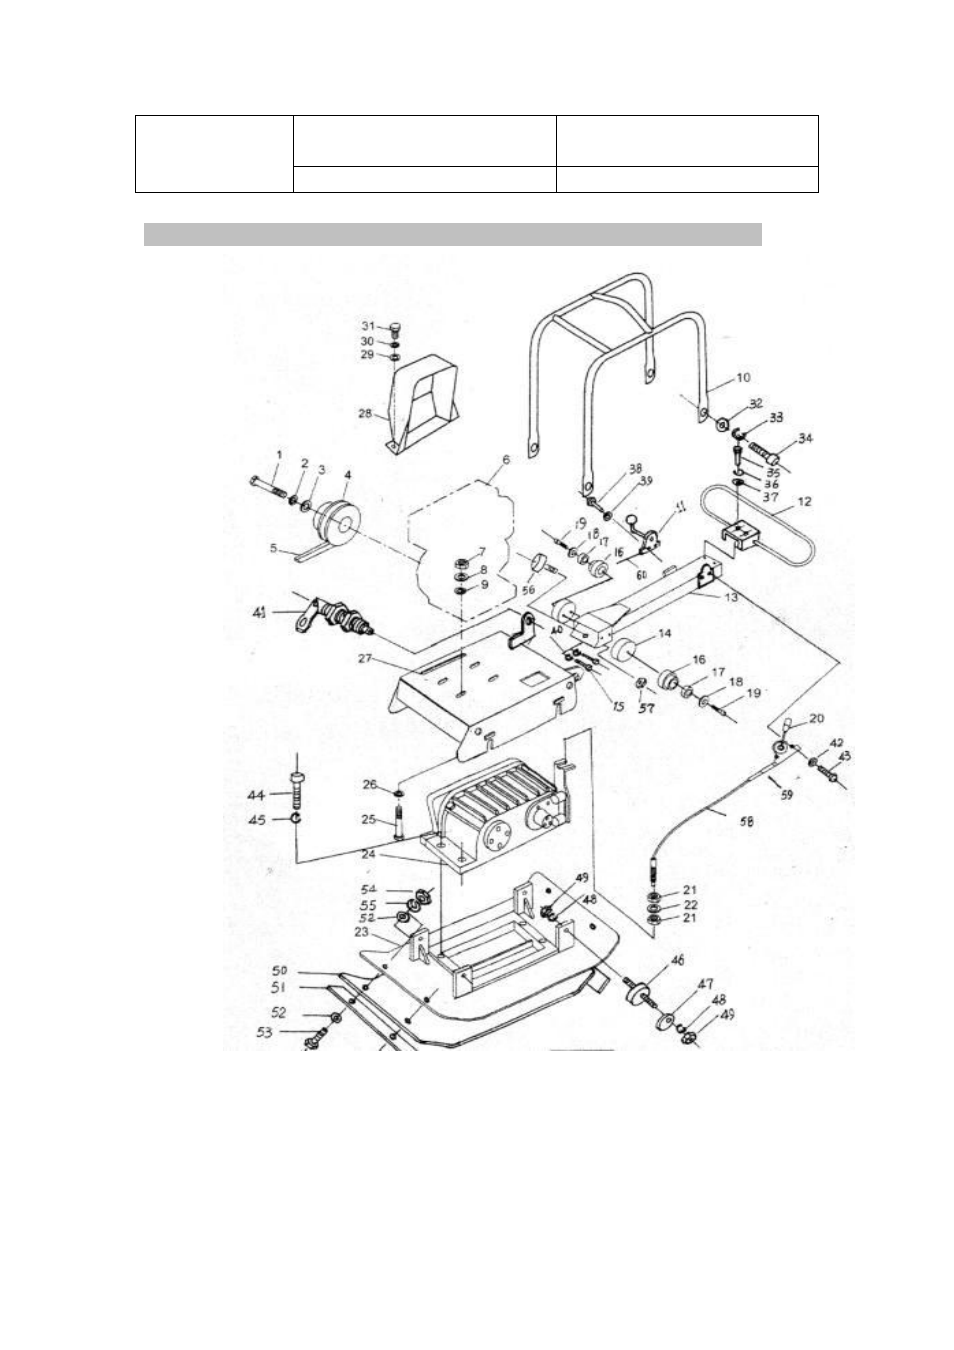 Kprc160 plate compactor diagram & part list, Kprc160 parts